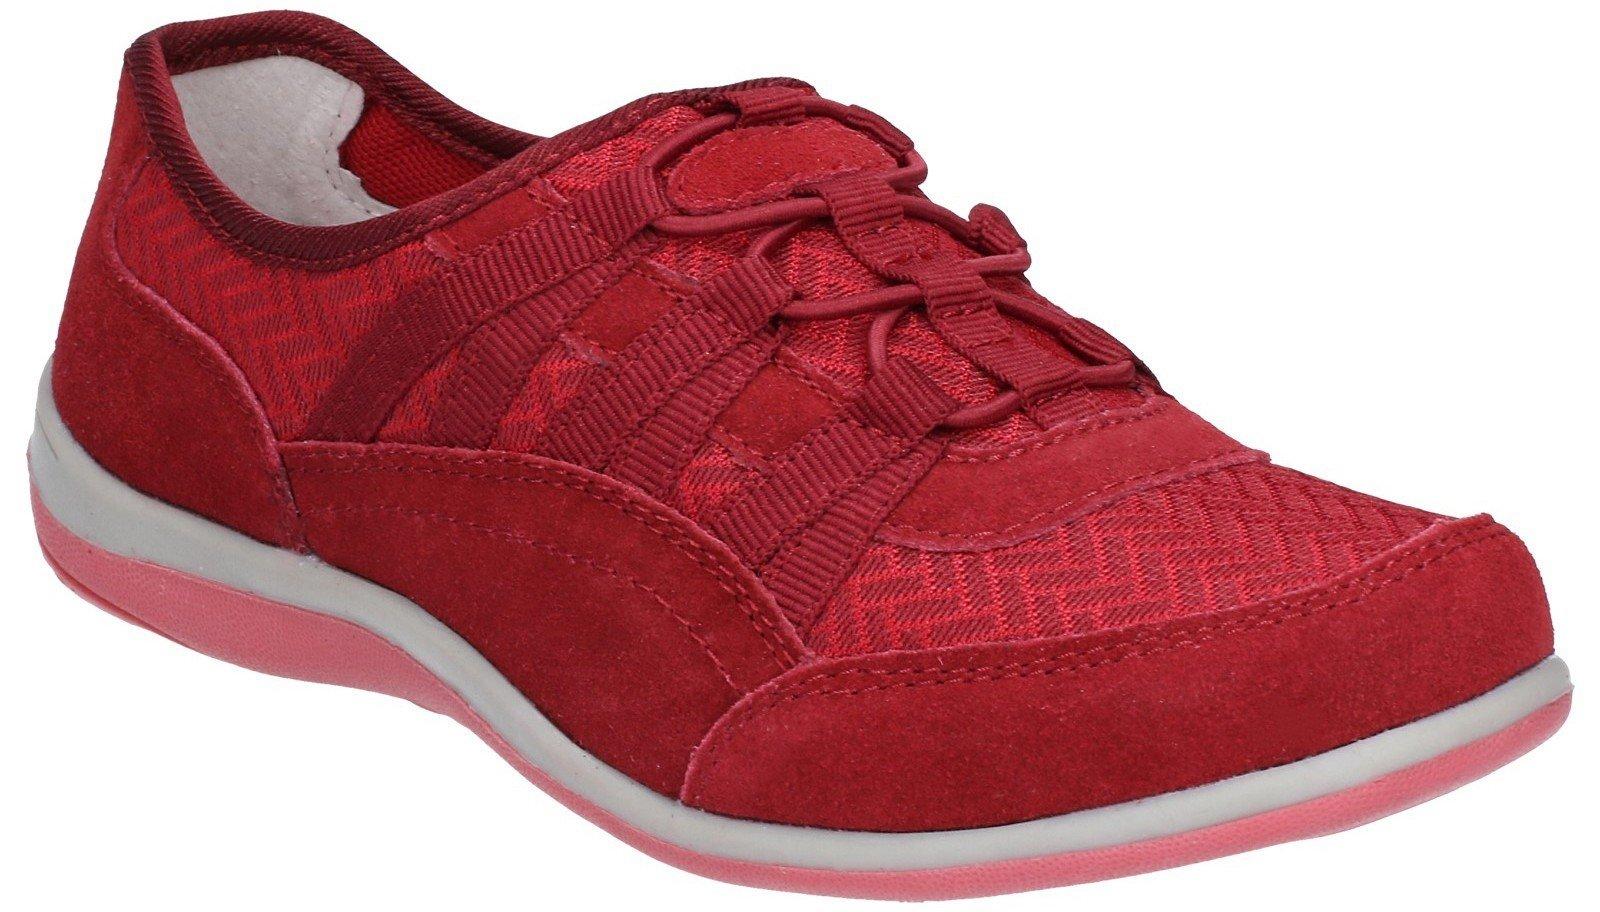 Fleet & Foster Women's Dahlia Trainer Various Colours 28258-47458 - Red 3